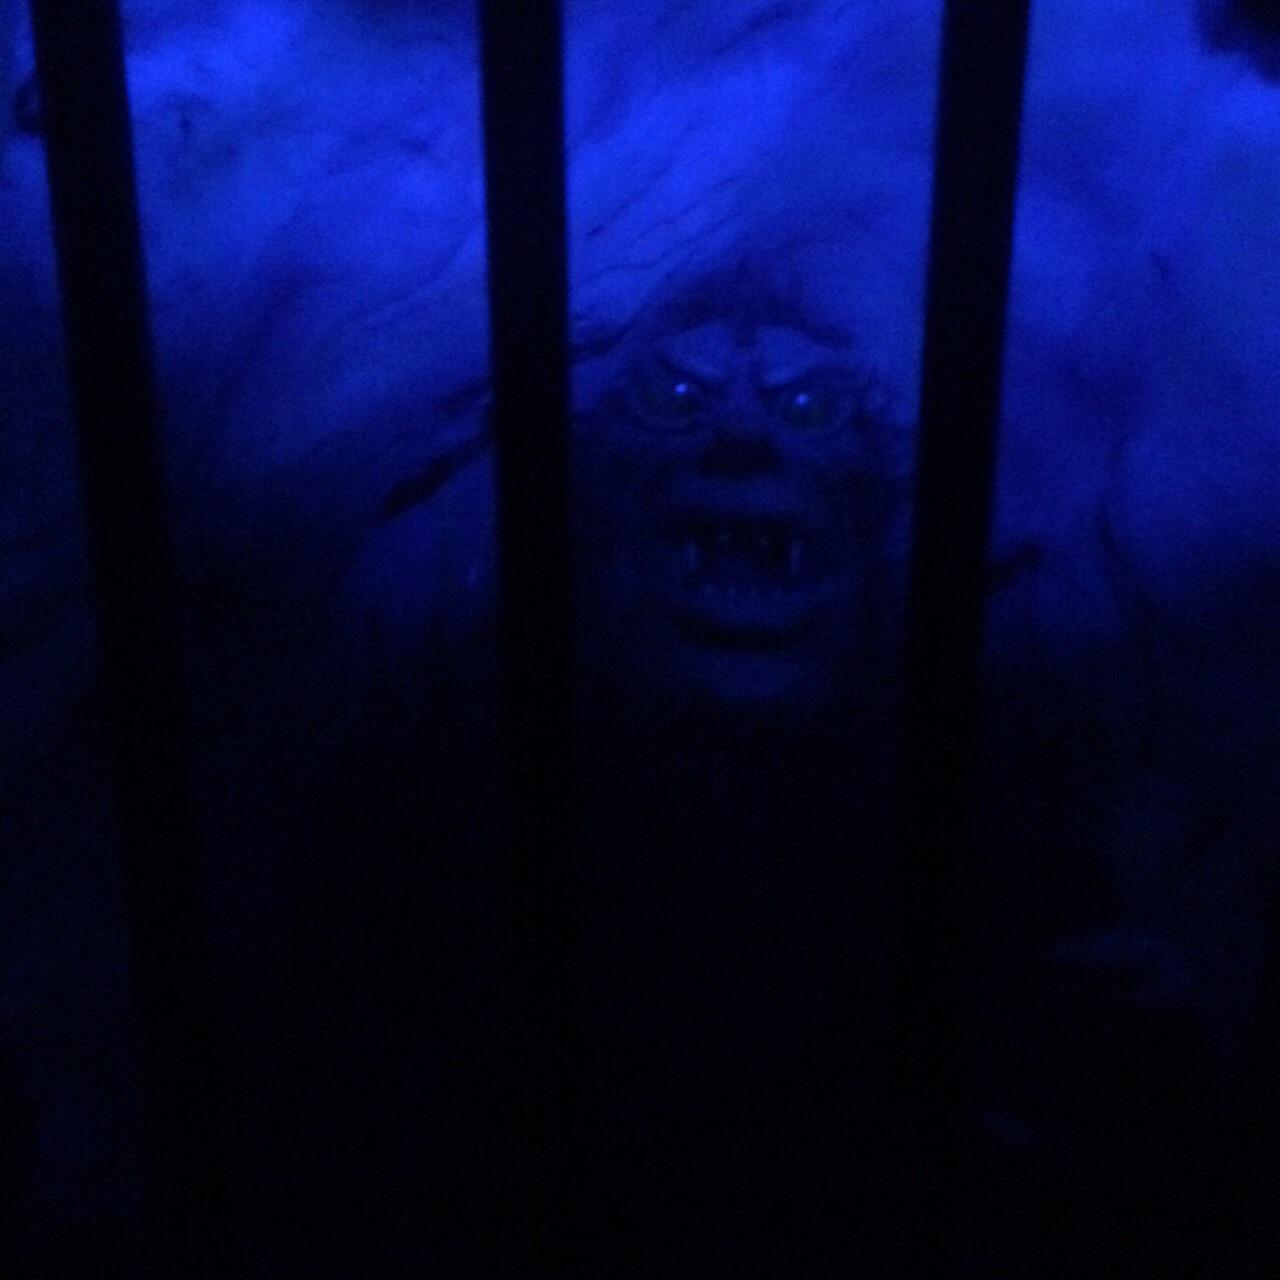 4. The Sleep of Reason Produces Monsters, Goya